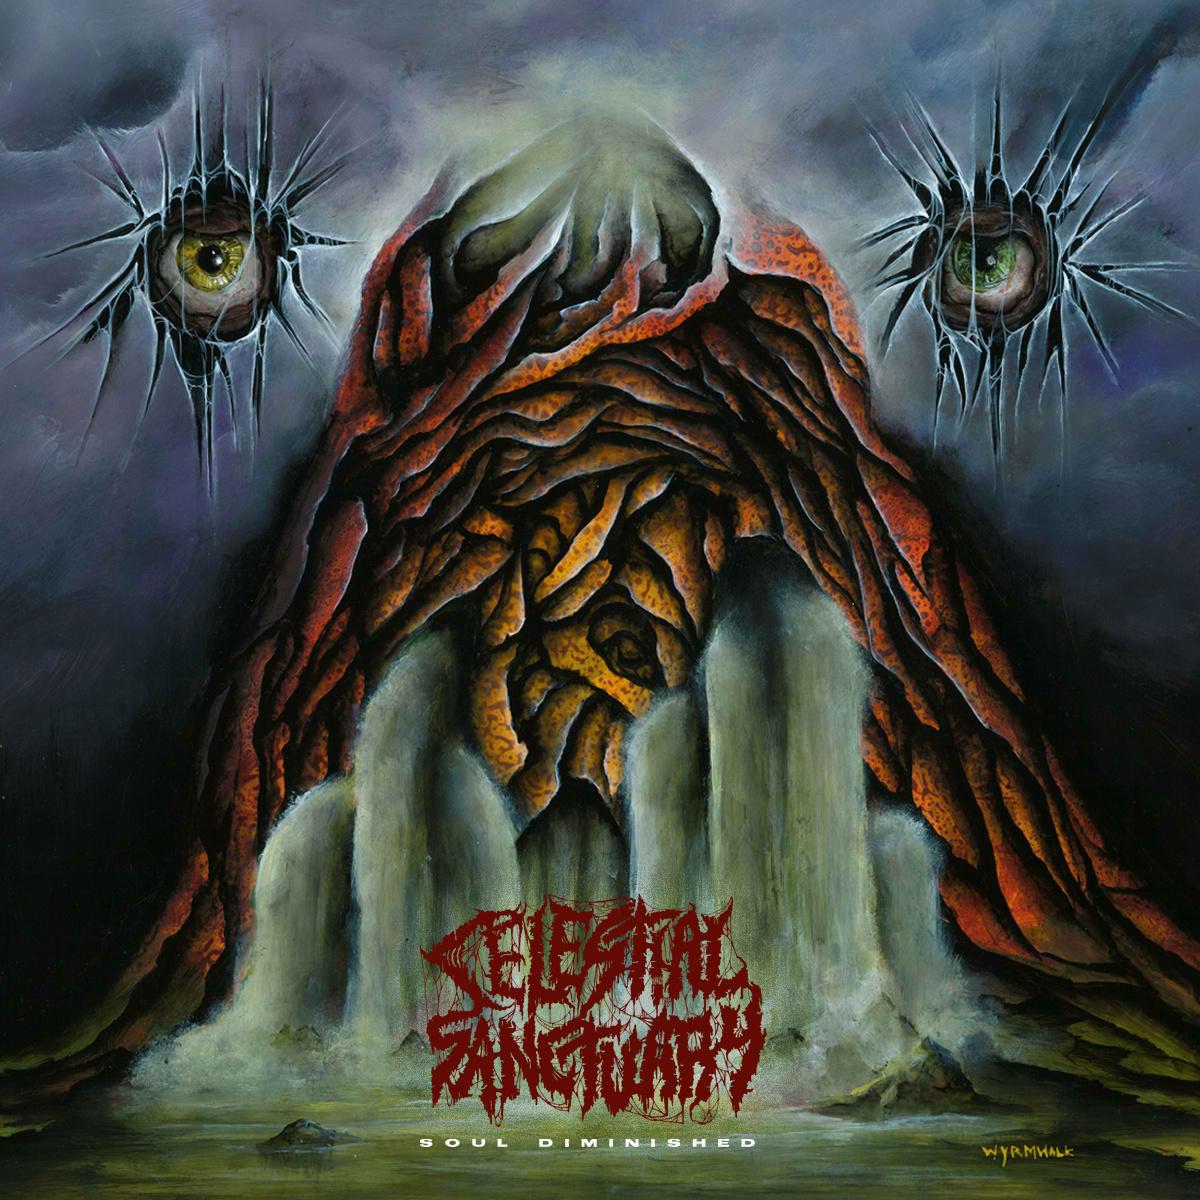 celestial sanctuary – soul diminished